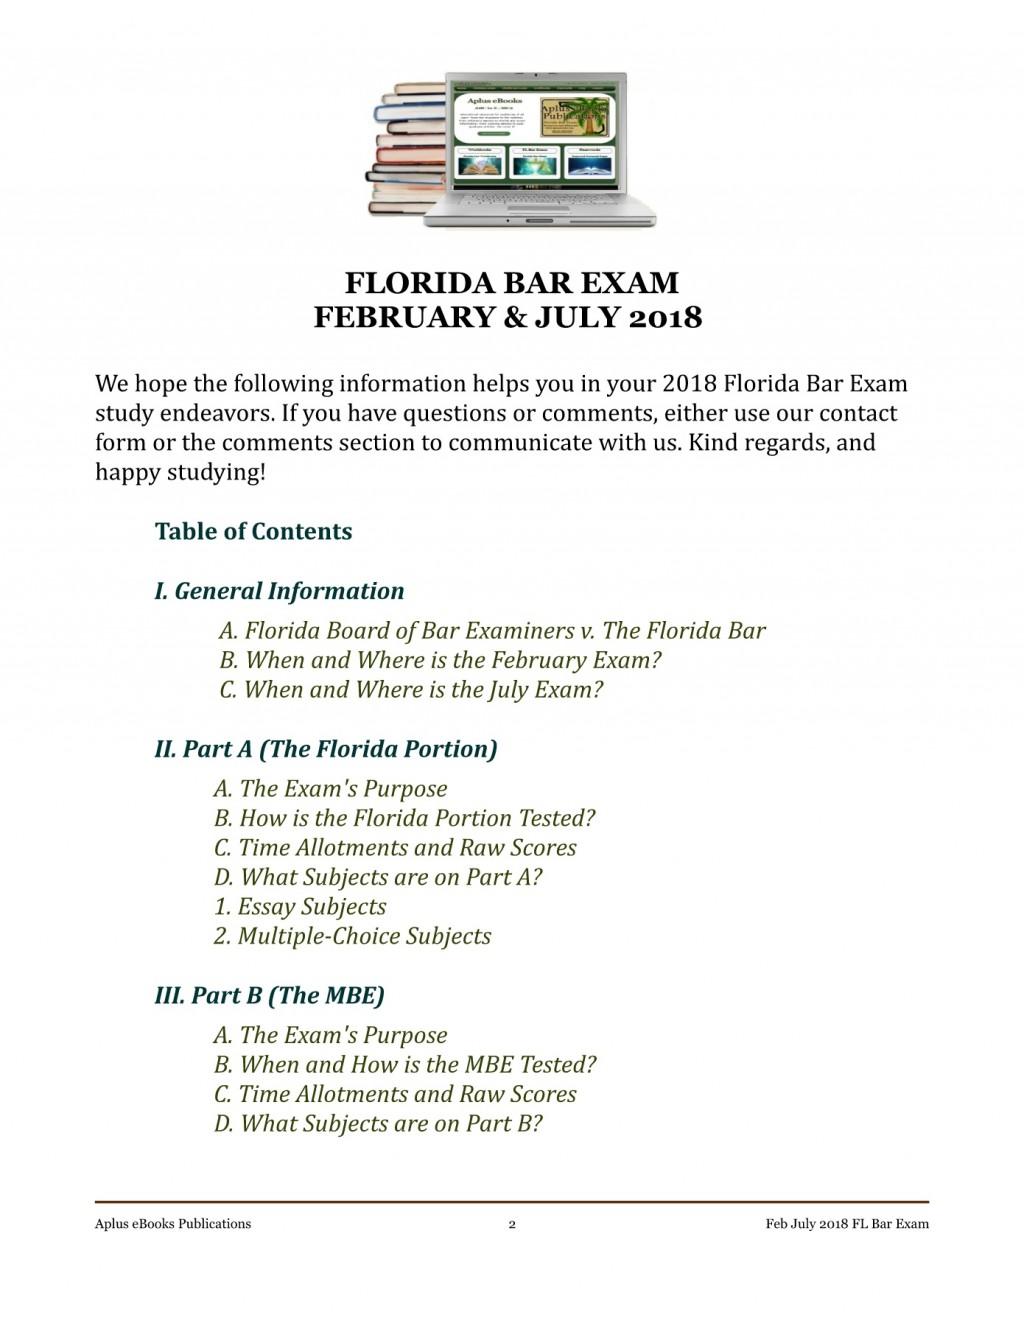 002 Florida Bar Essays Essay Exceptional July 2018 Exam 2017 Feb Large